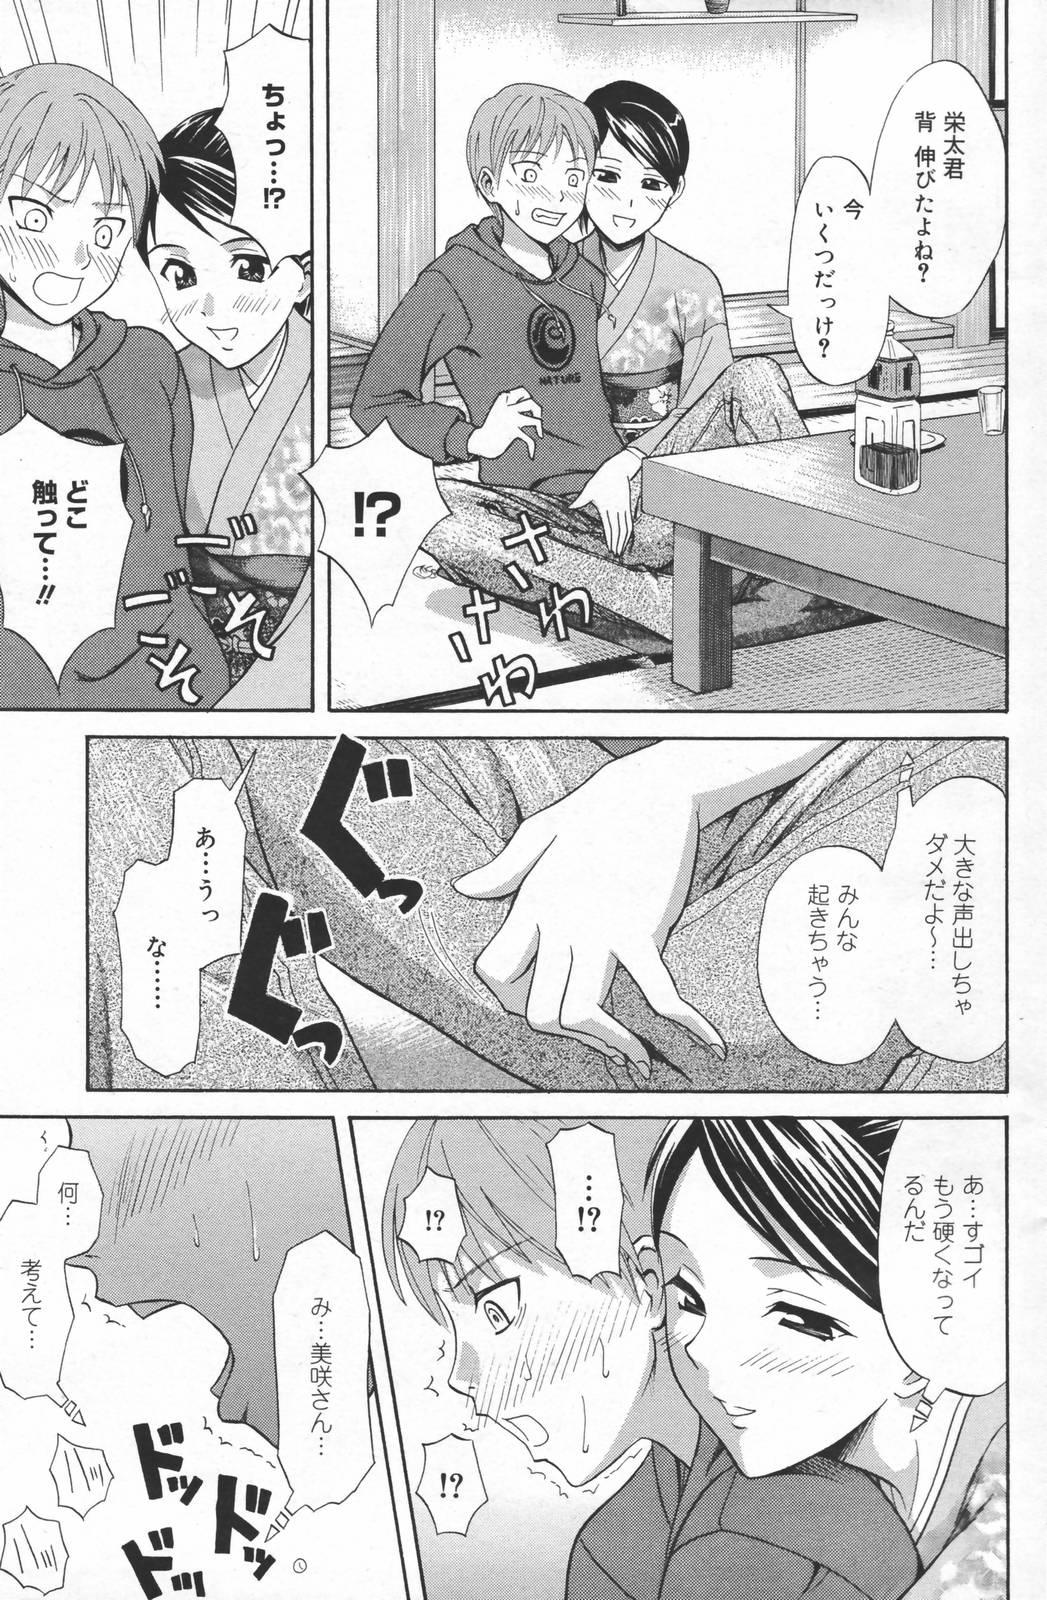 Manga Bangaichi 2007-03 96